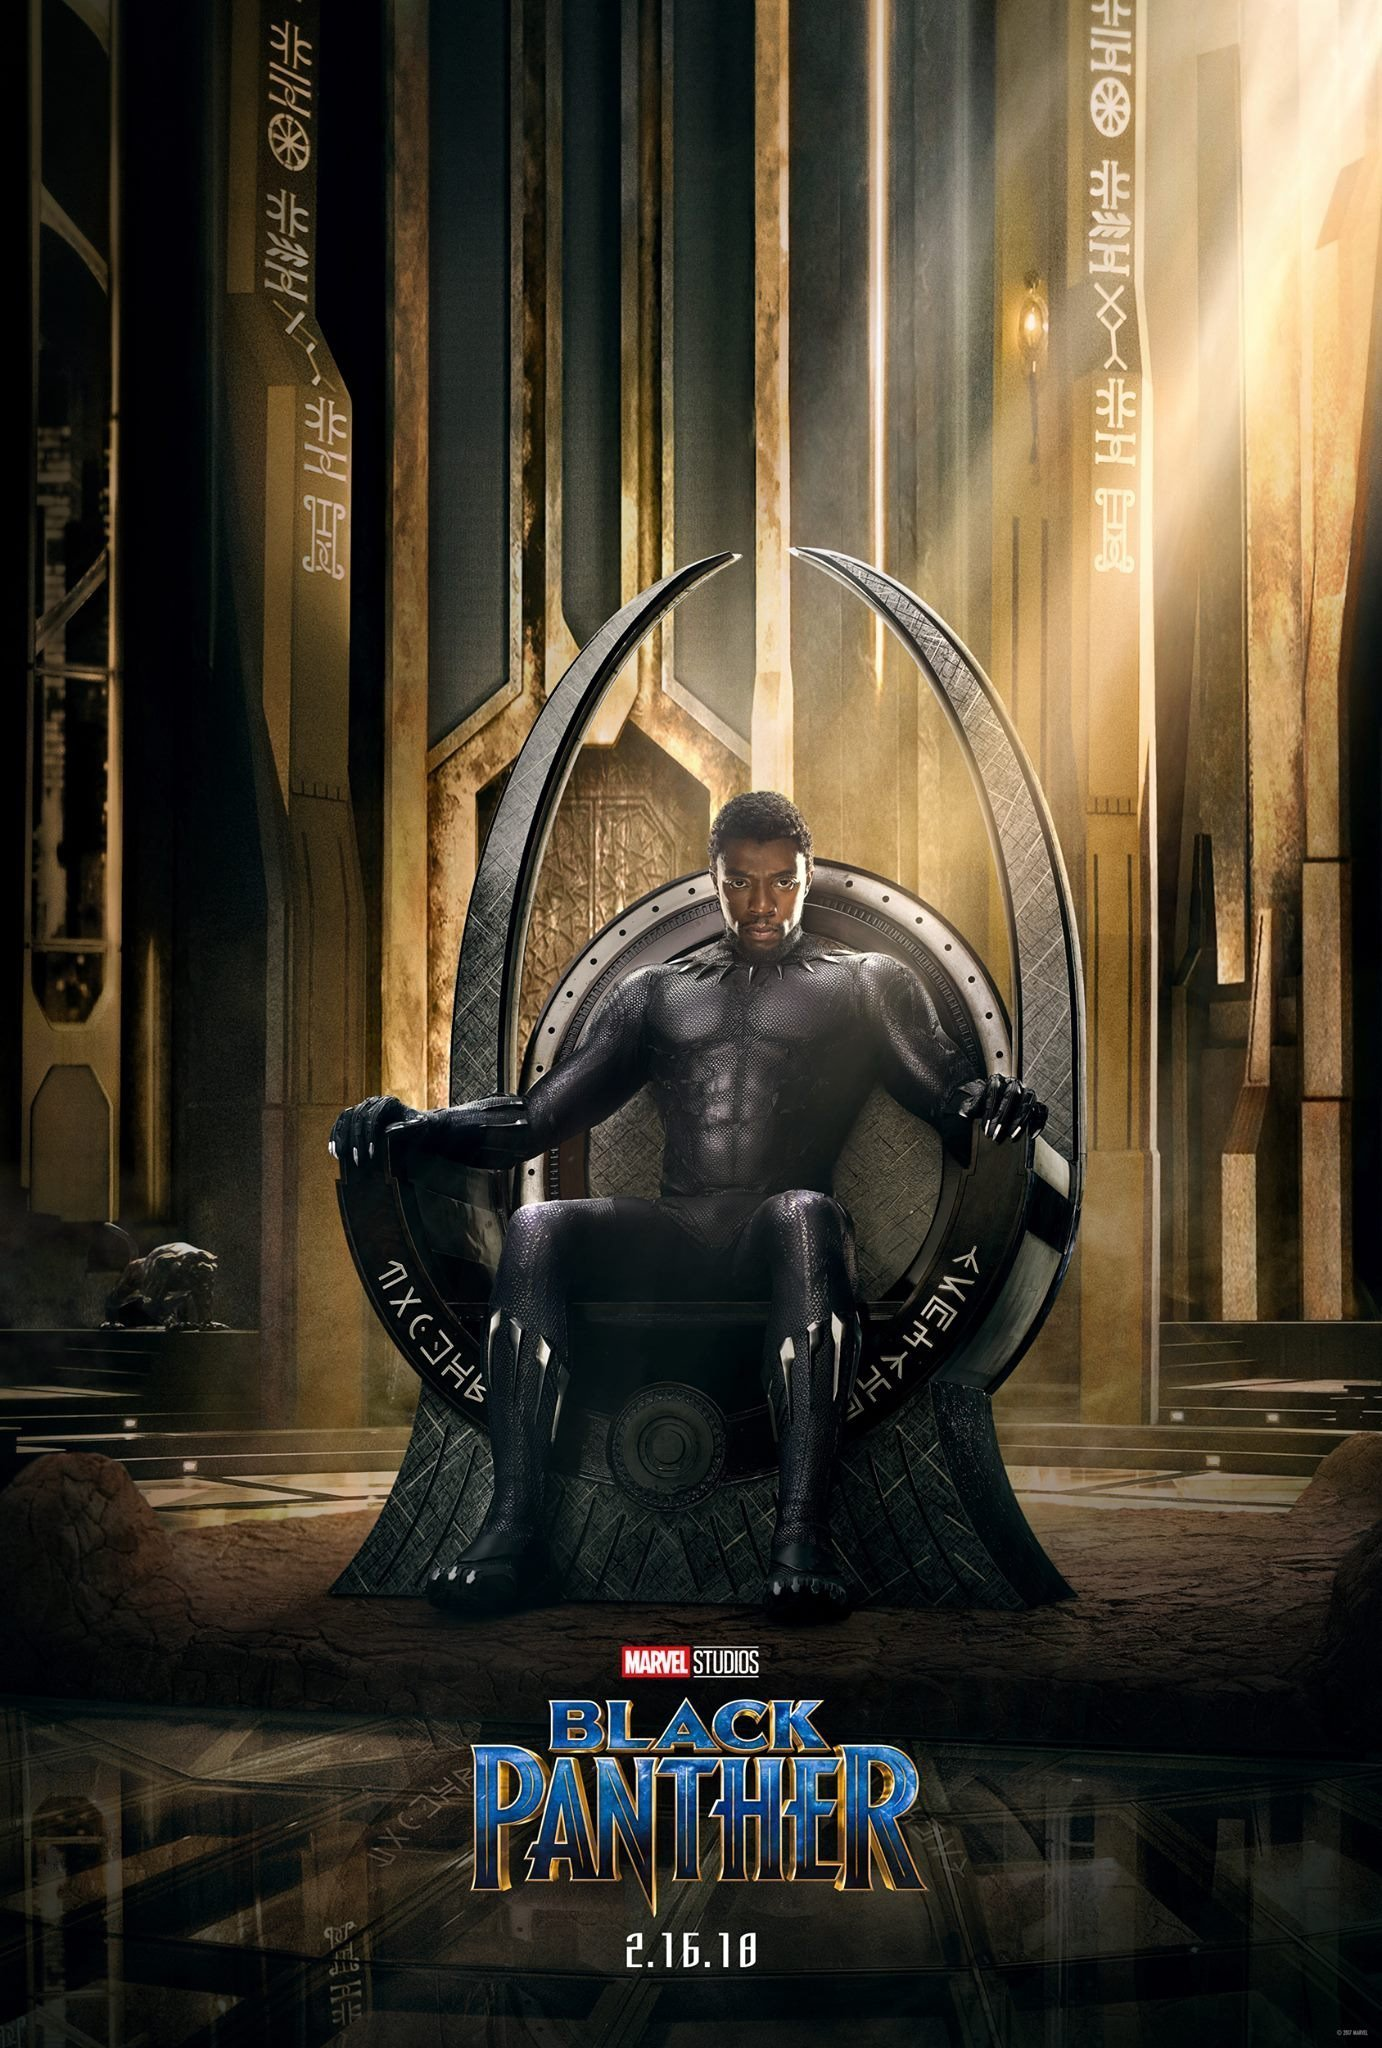 Poster teaser du film Black Panther avec Chadwick Boseman